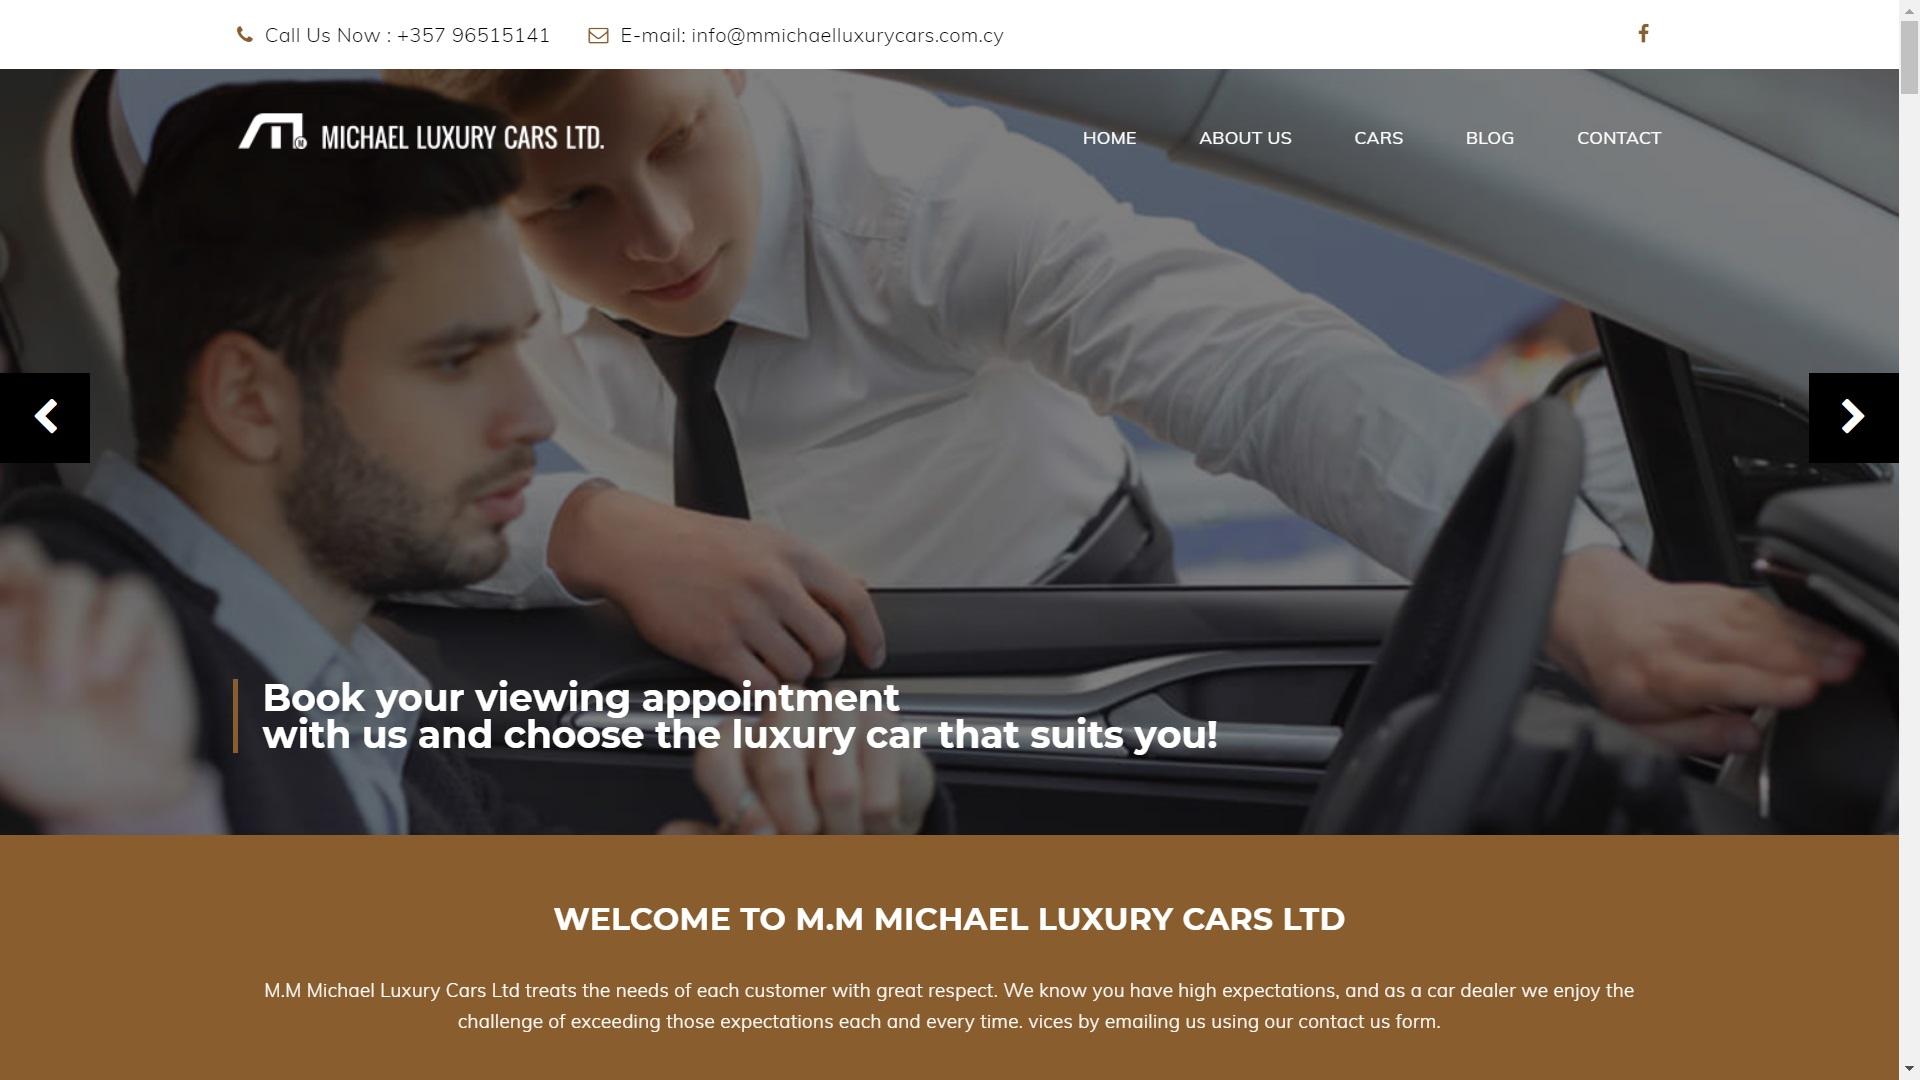 MMICHAELLUXURYCARS.COM.CY